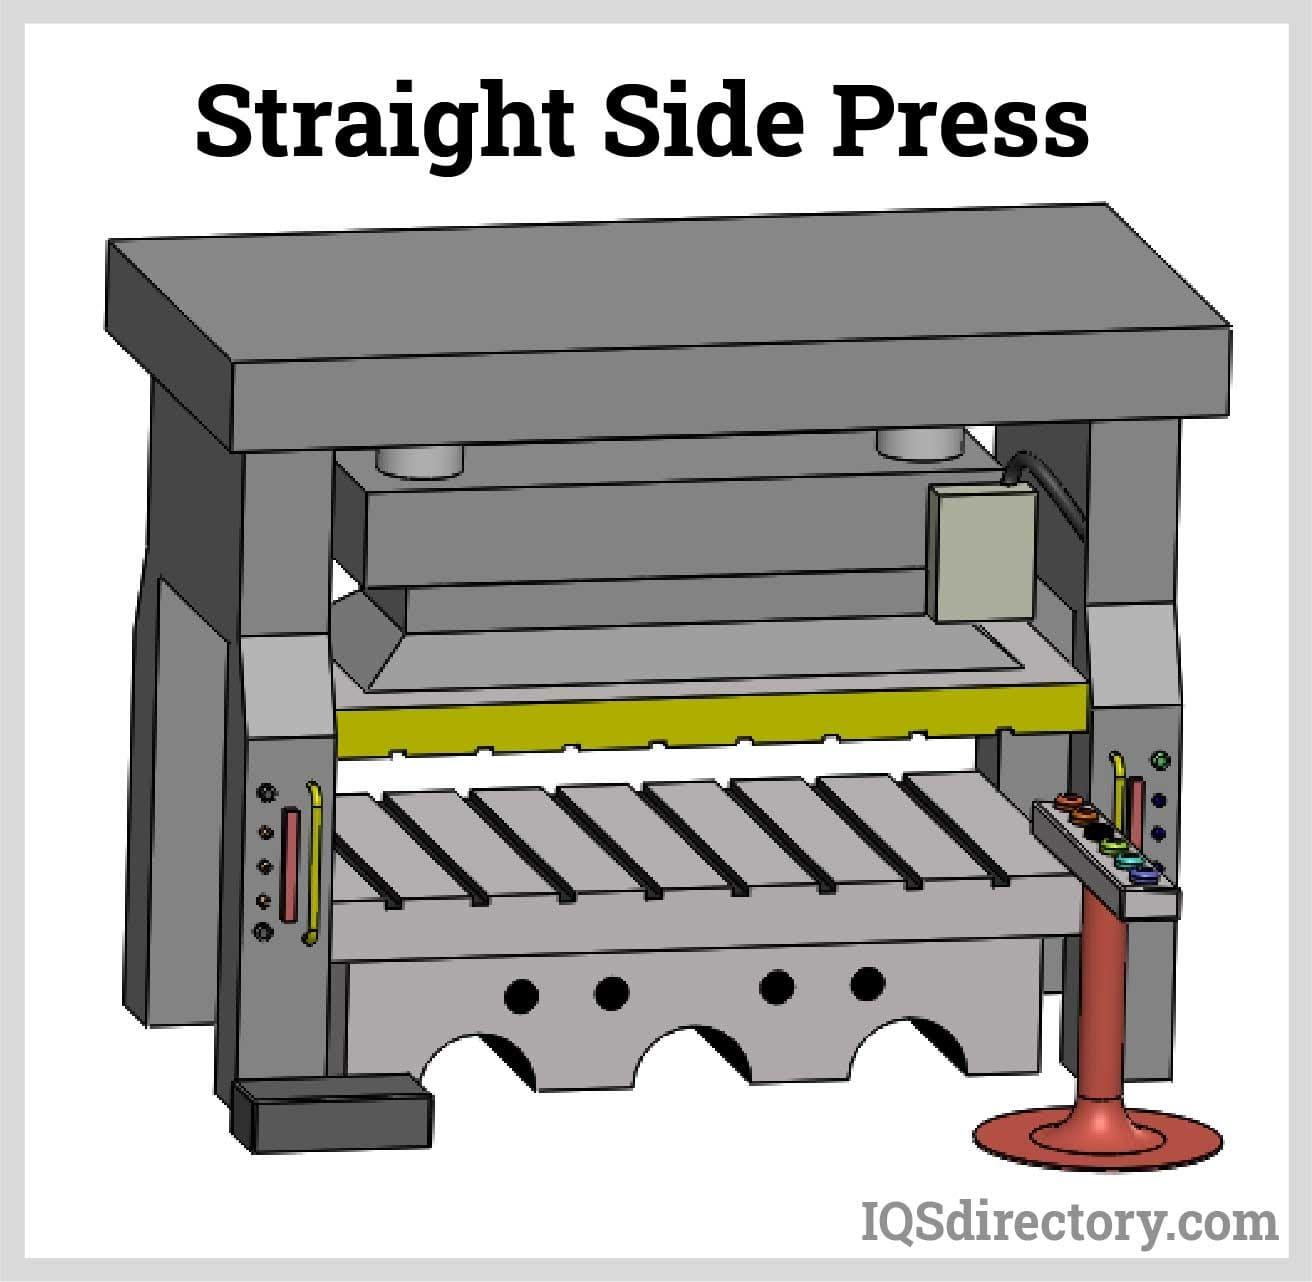 Straight Side Press